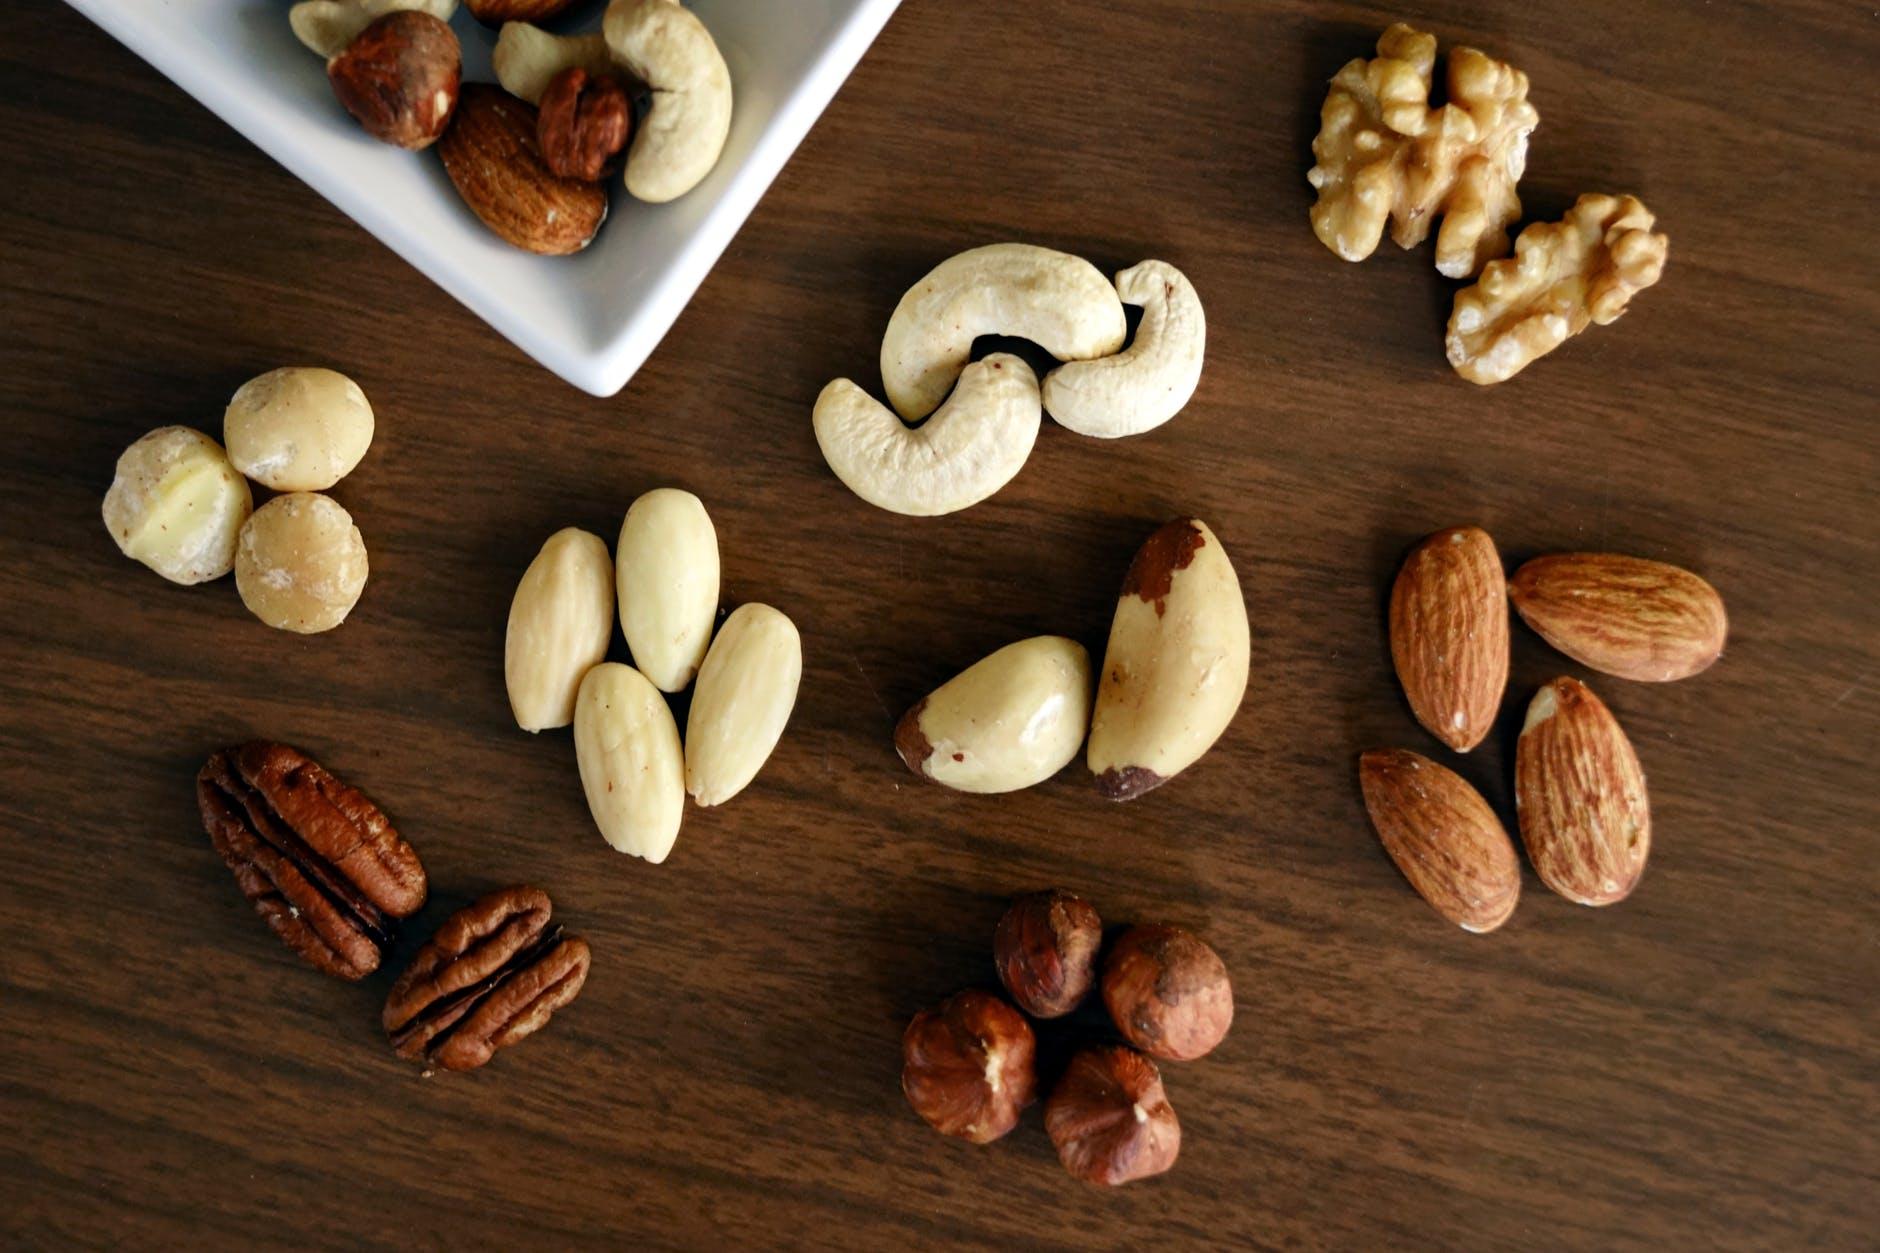 Nuts boosts sperm quality